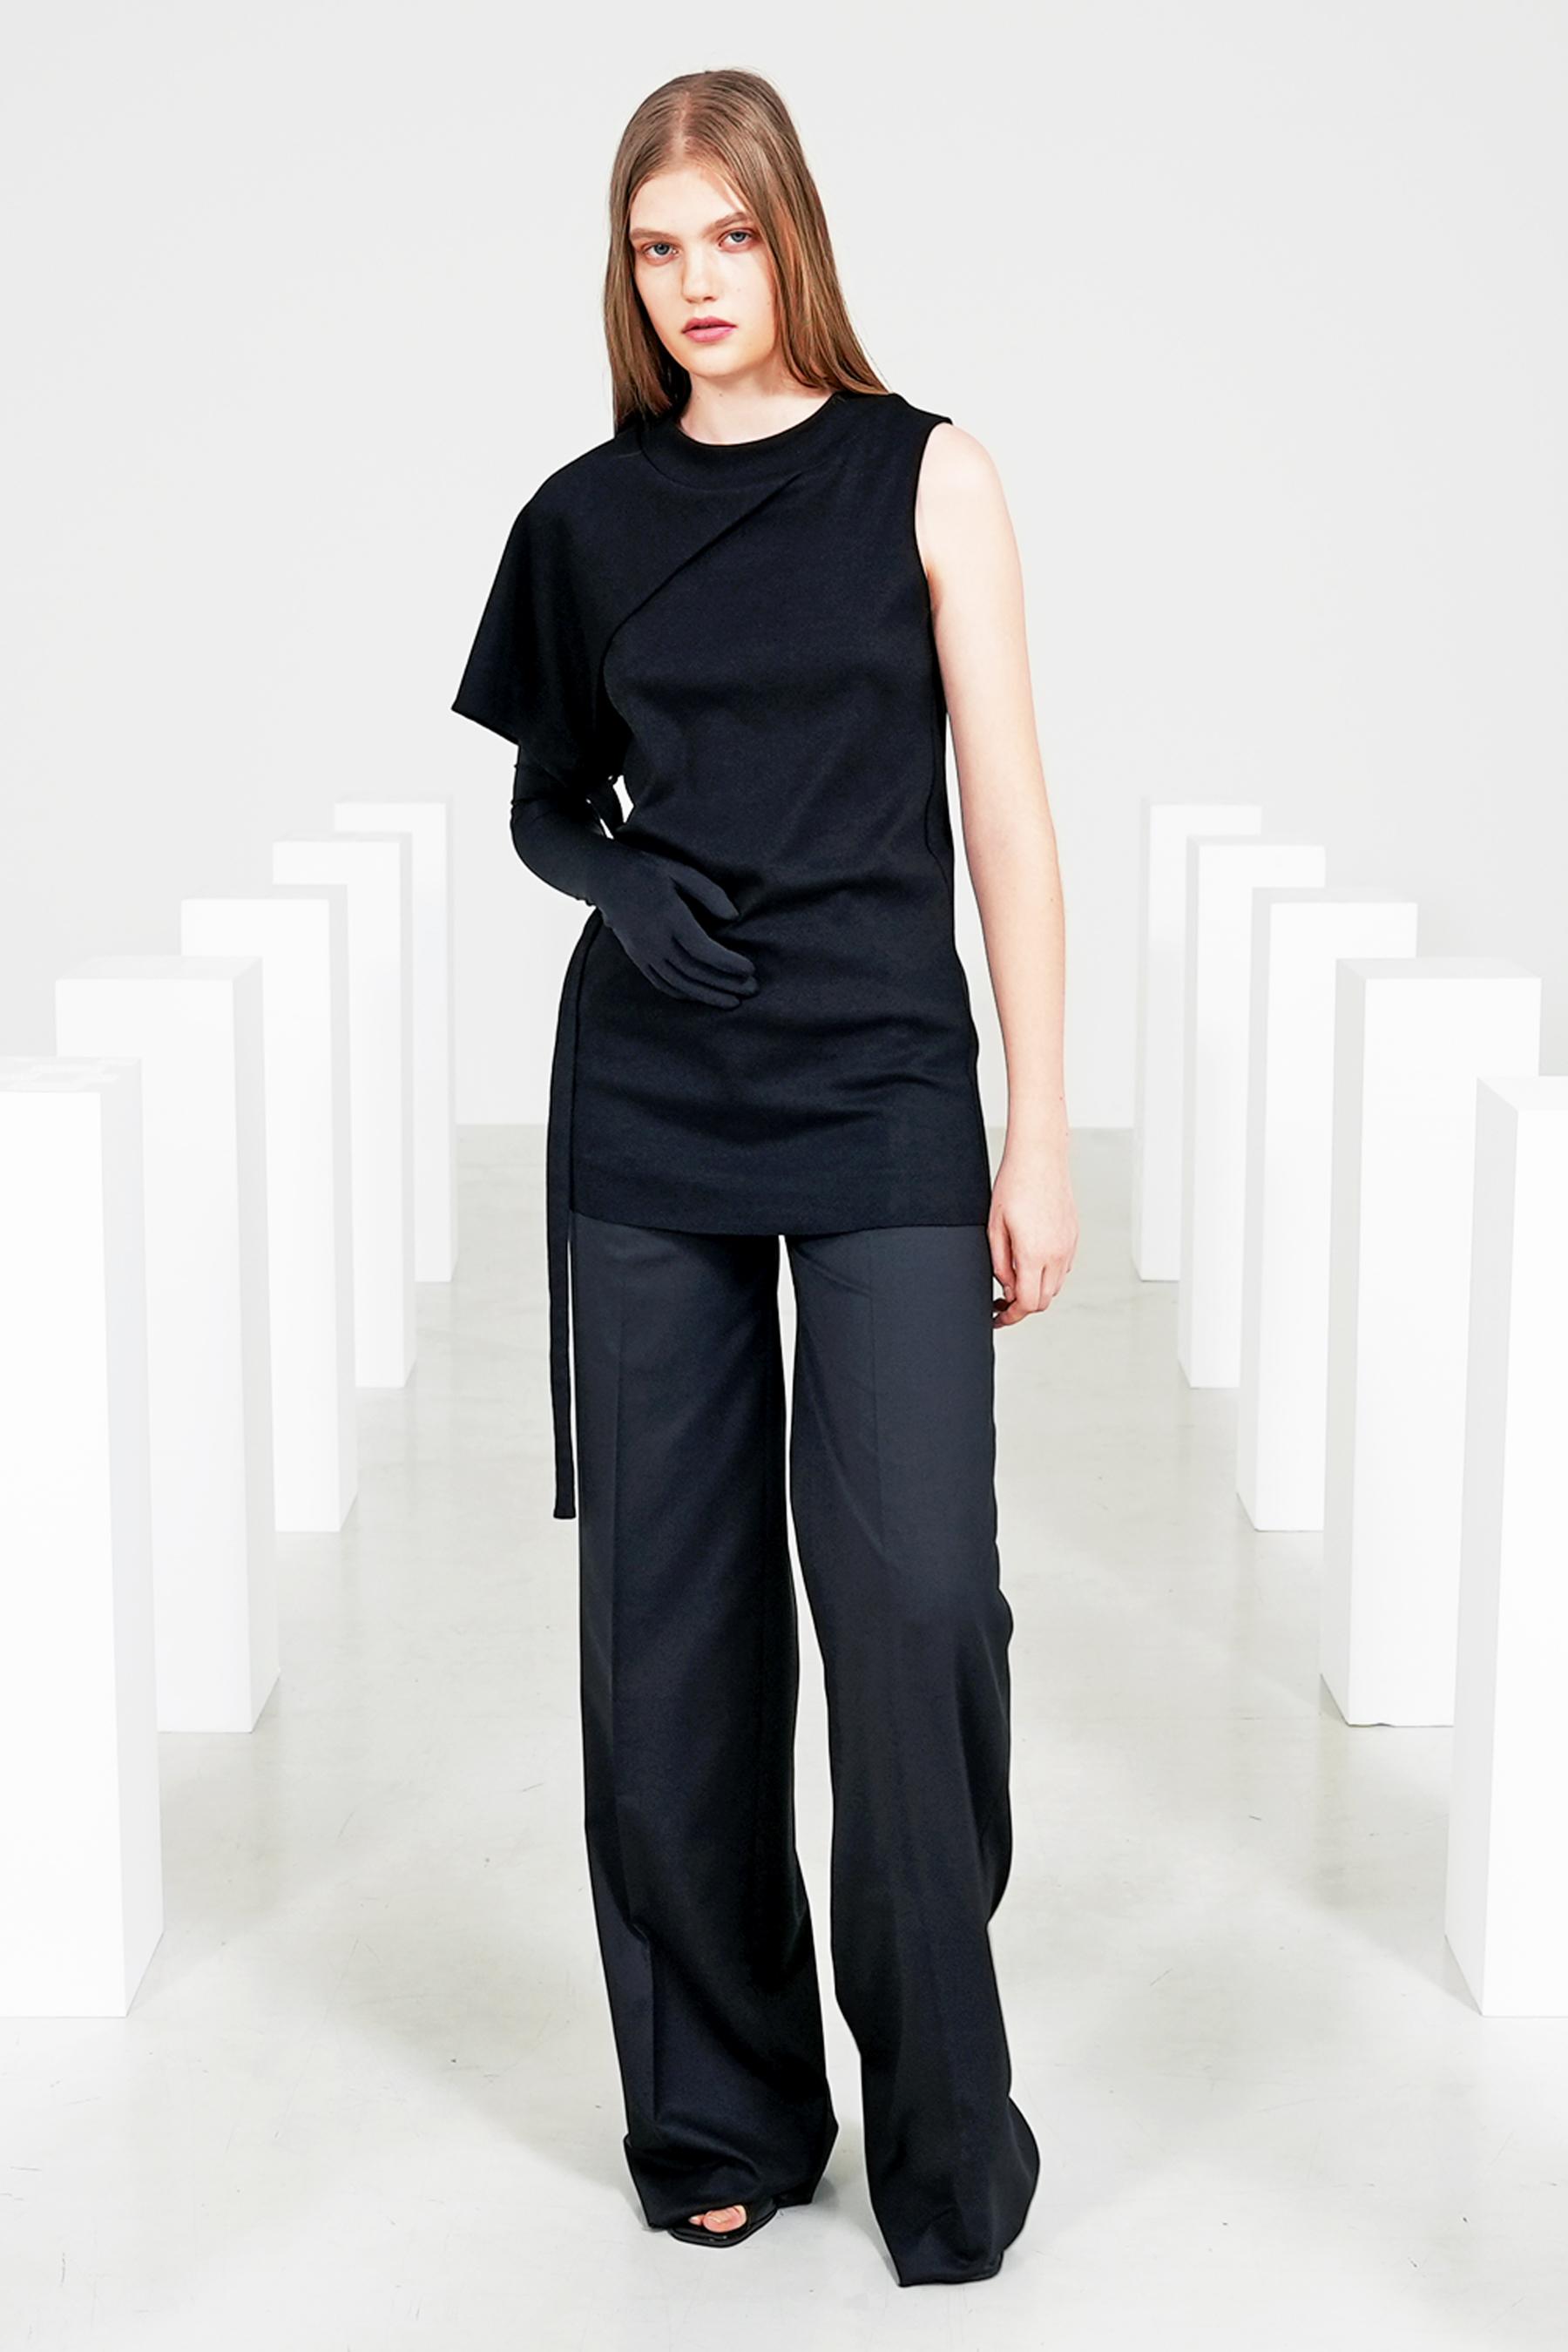 Sartograph Spring 2022  Fashion Show